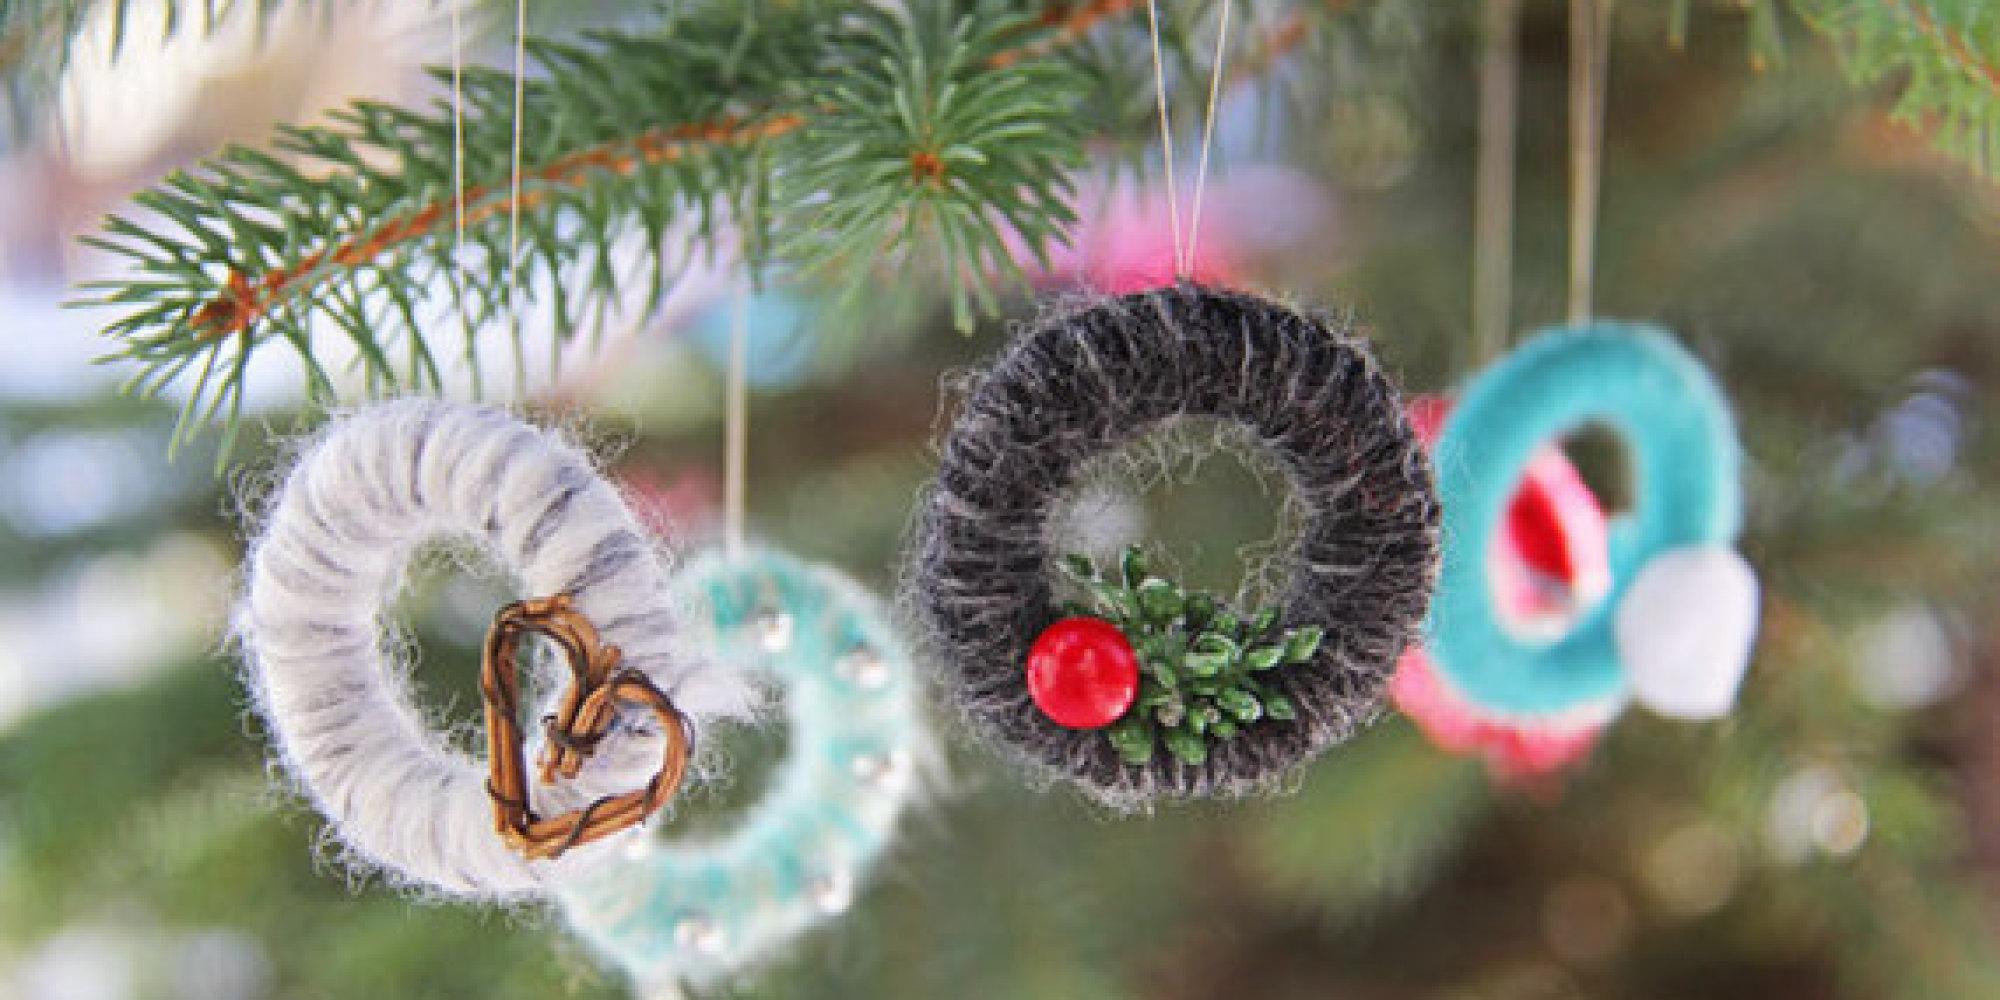 Hometalk diy christmas window decoration - 33 Totally Original Diy Ornaments That Win At Christmas Tree Decorating Huffpost